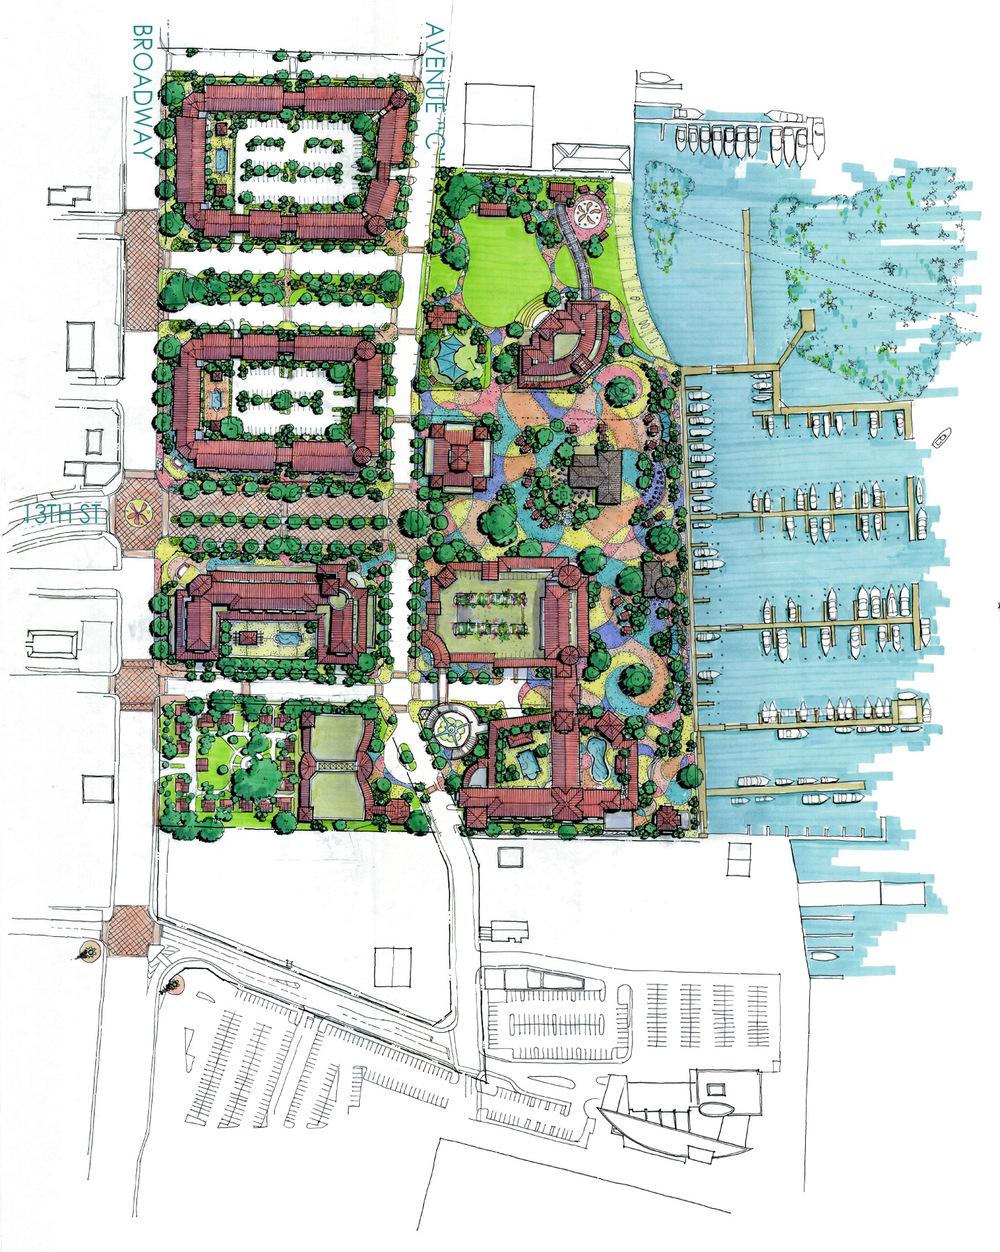 REINES & STRAZ - Architecture Interiors Planning - Riviera Beach Marina - Study*